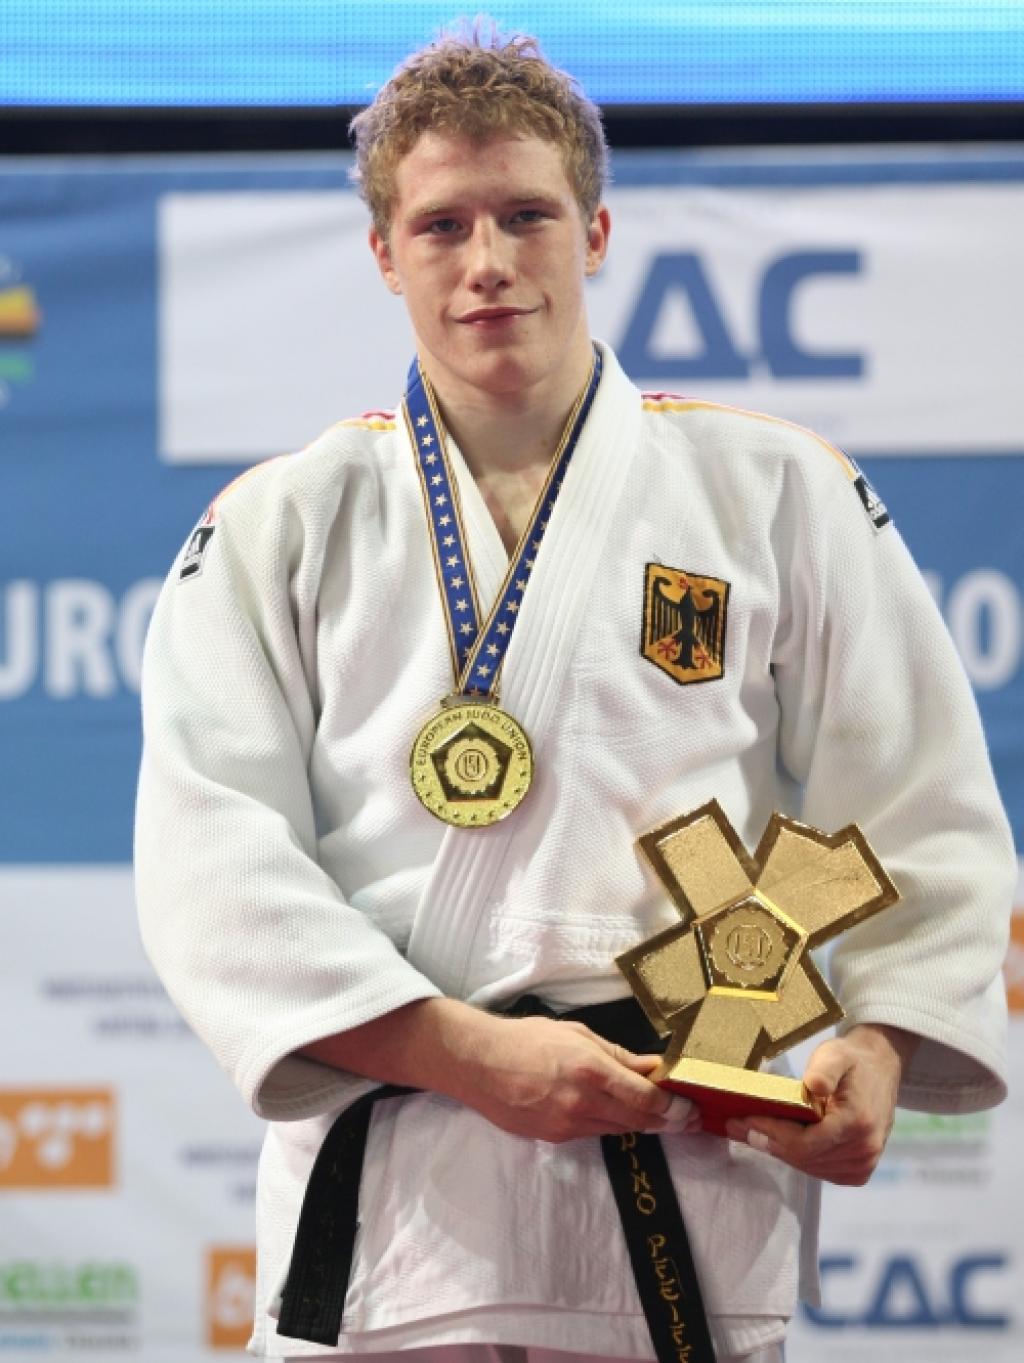 Dino Pfeiffer wins European U23 title U100kg